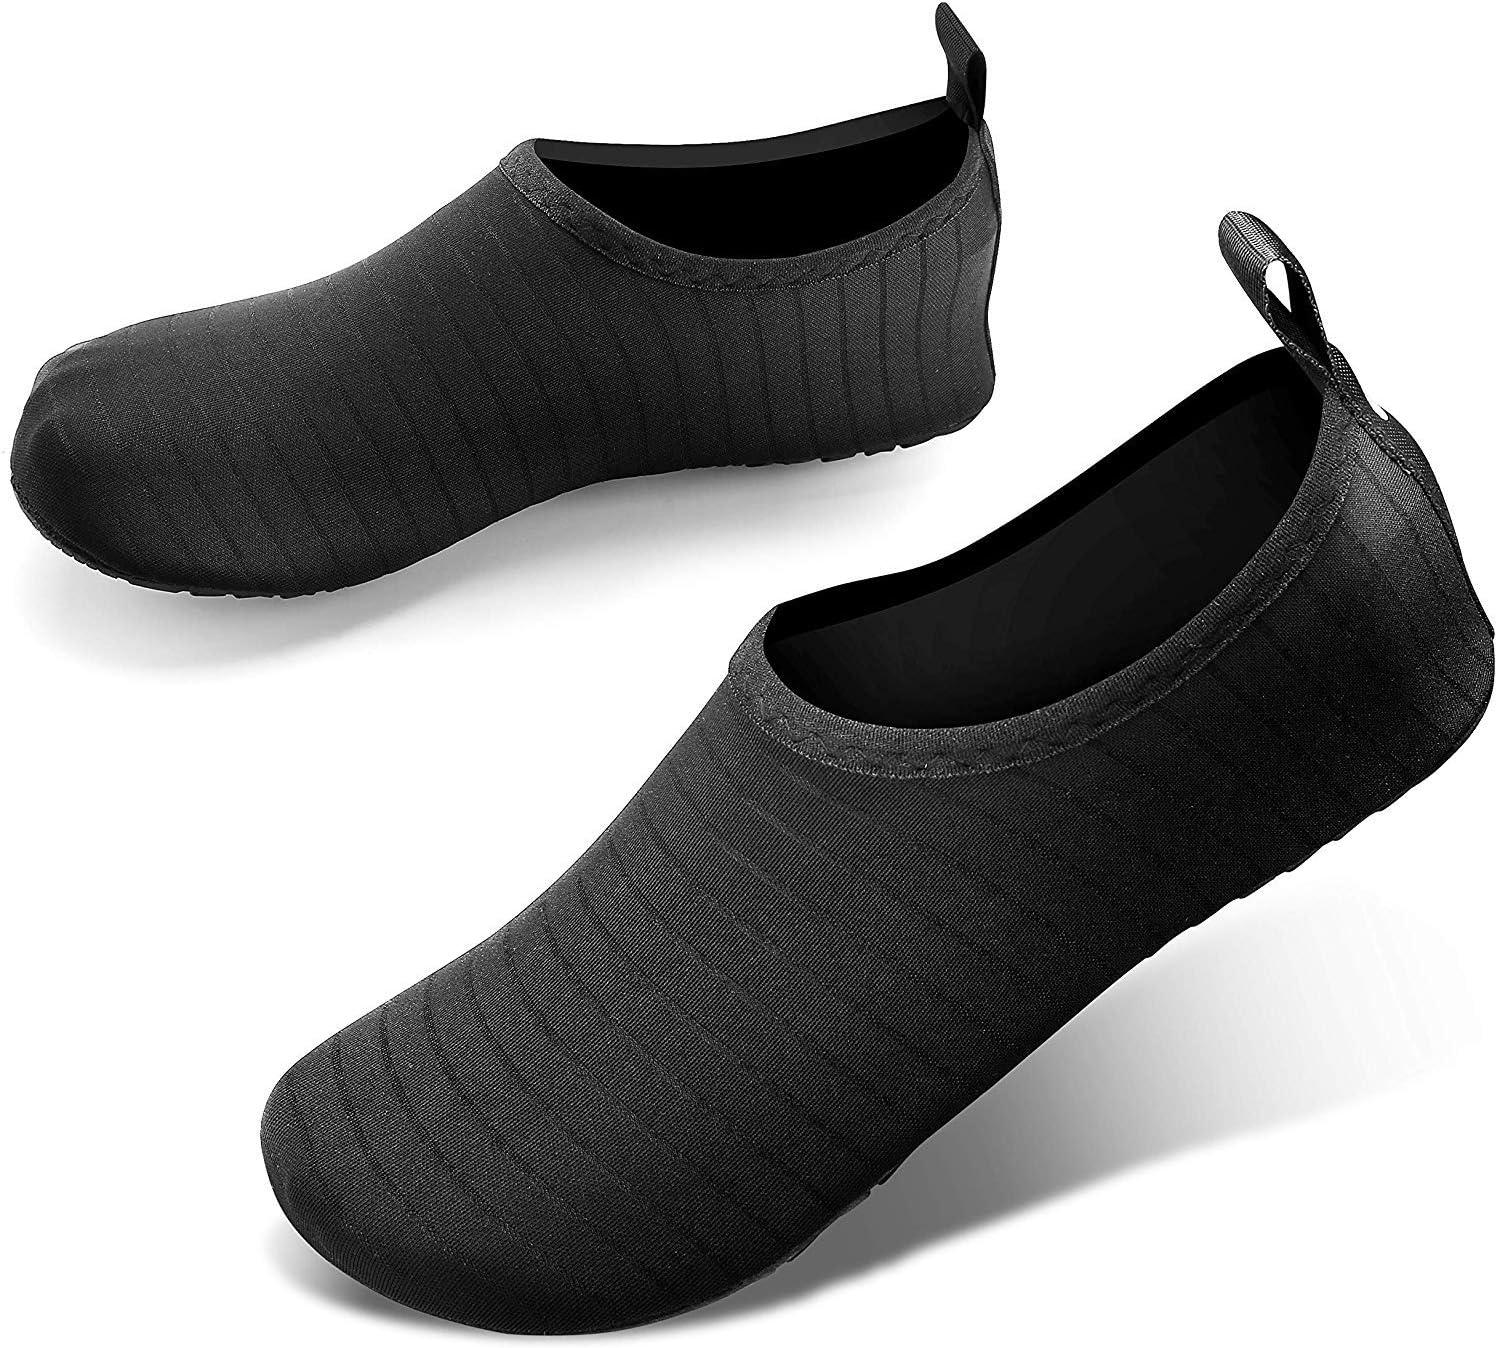 JOTO Women's Men Kids, Barefoot Quick-Dry Aqua Water Socks Slip-